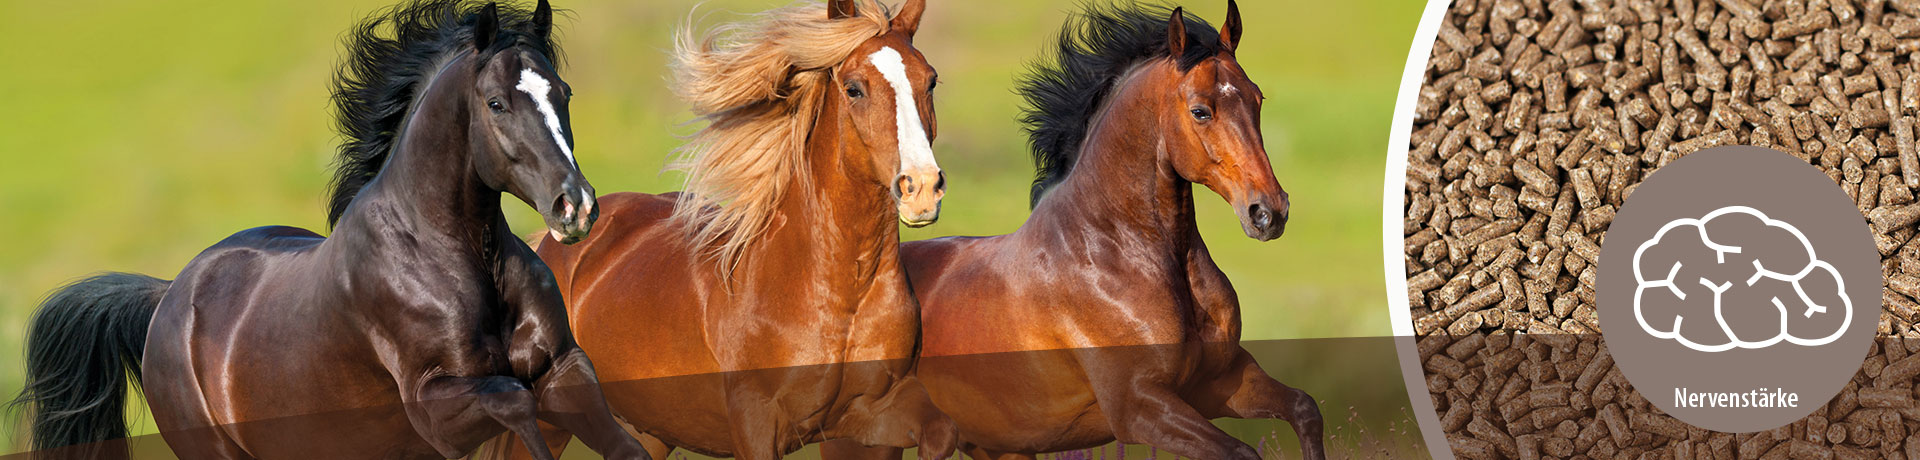 Pferd - Unterkategorie - Nervenstärke